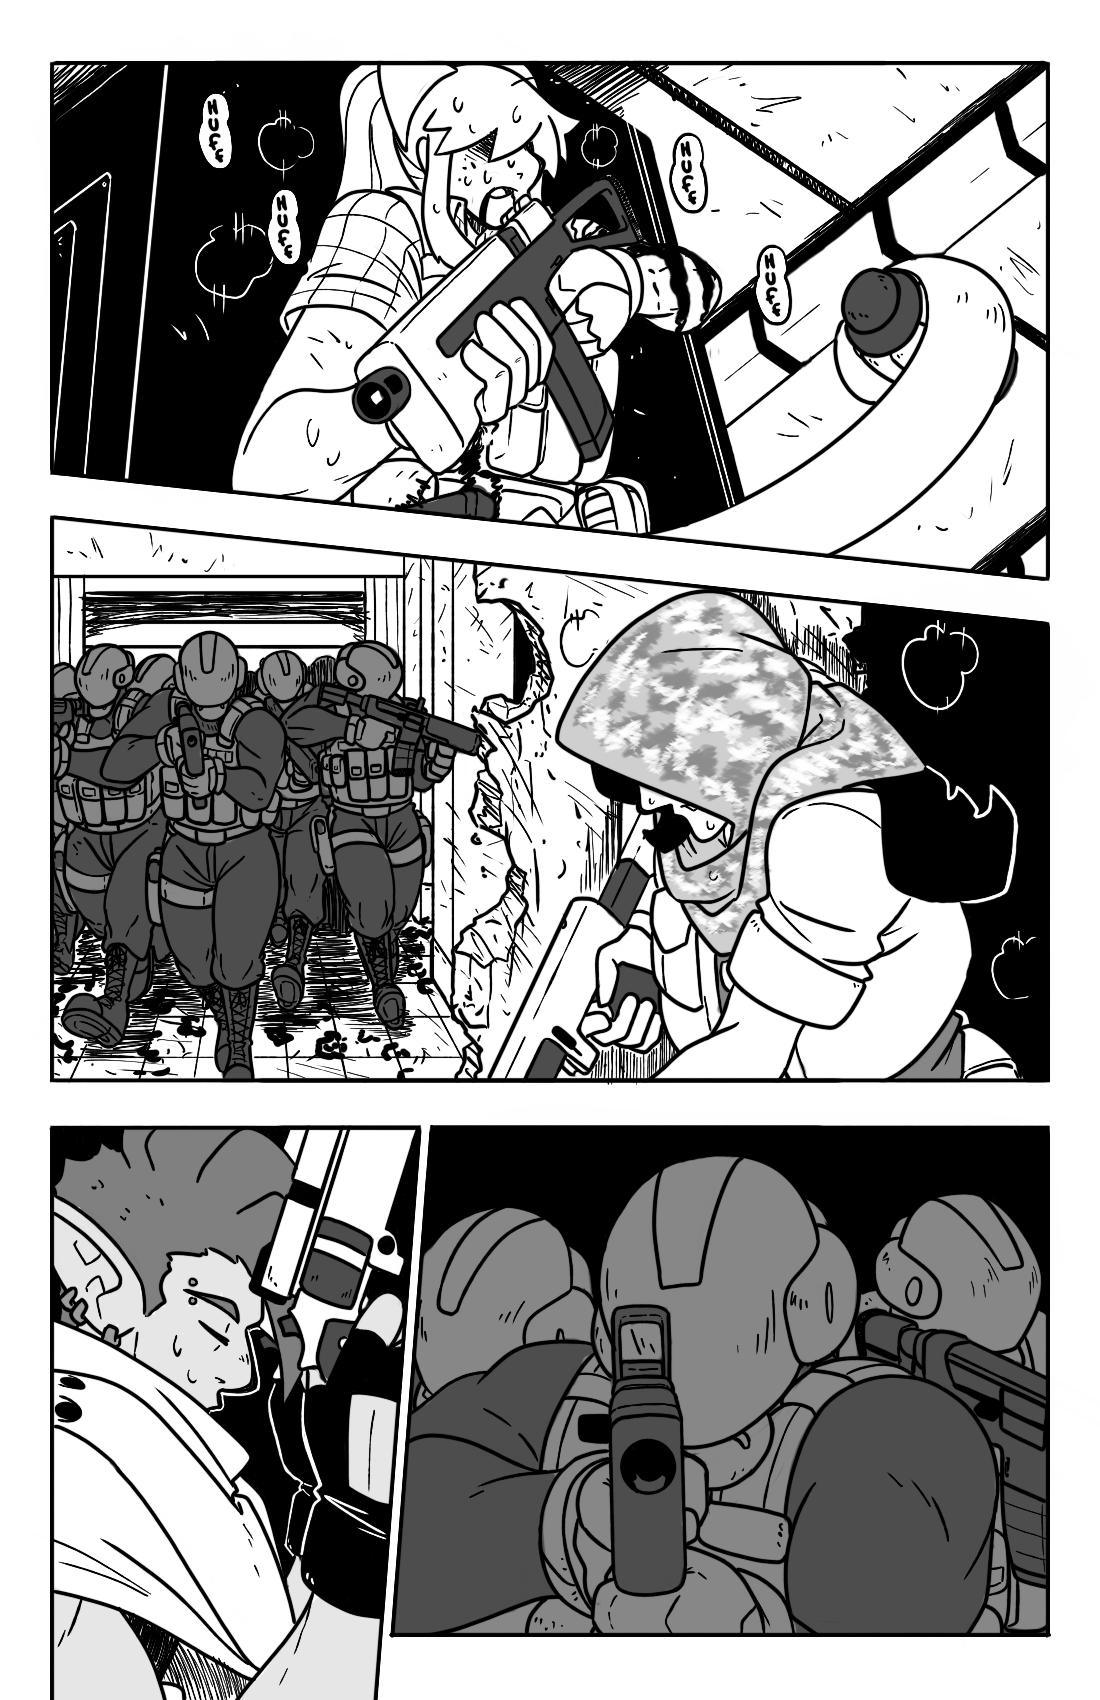 Pony Express Part 1 pg.34